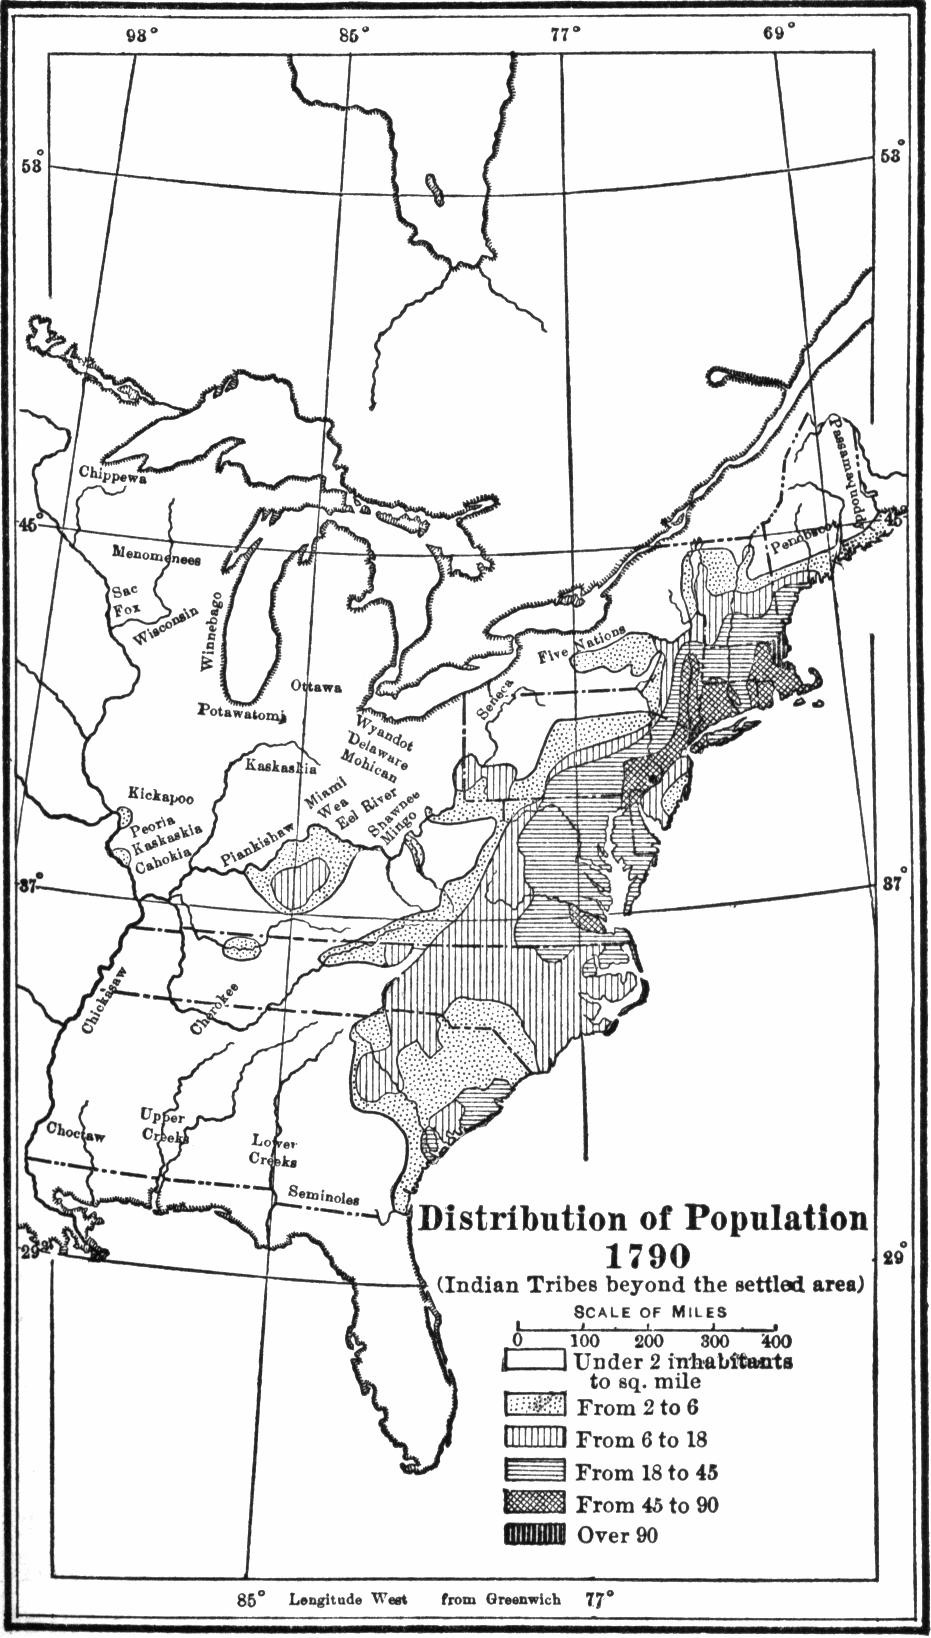 USA population distribution 1790